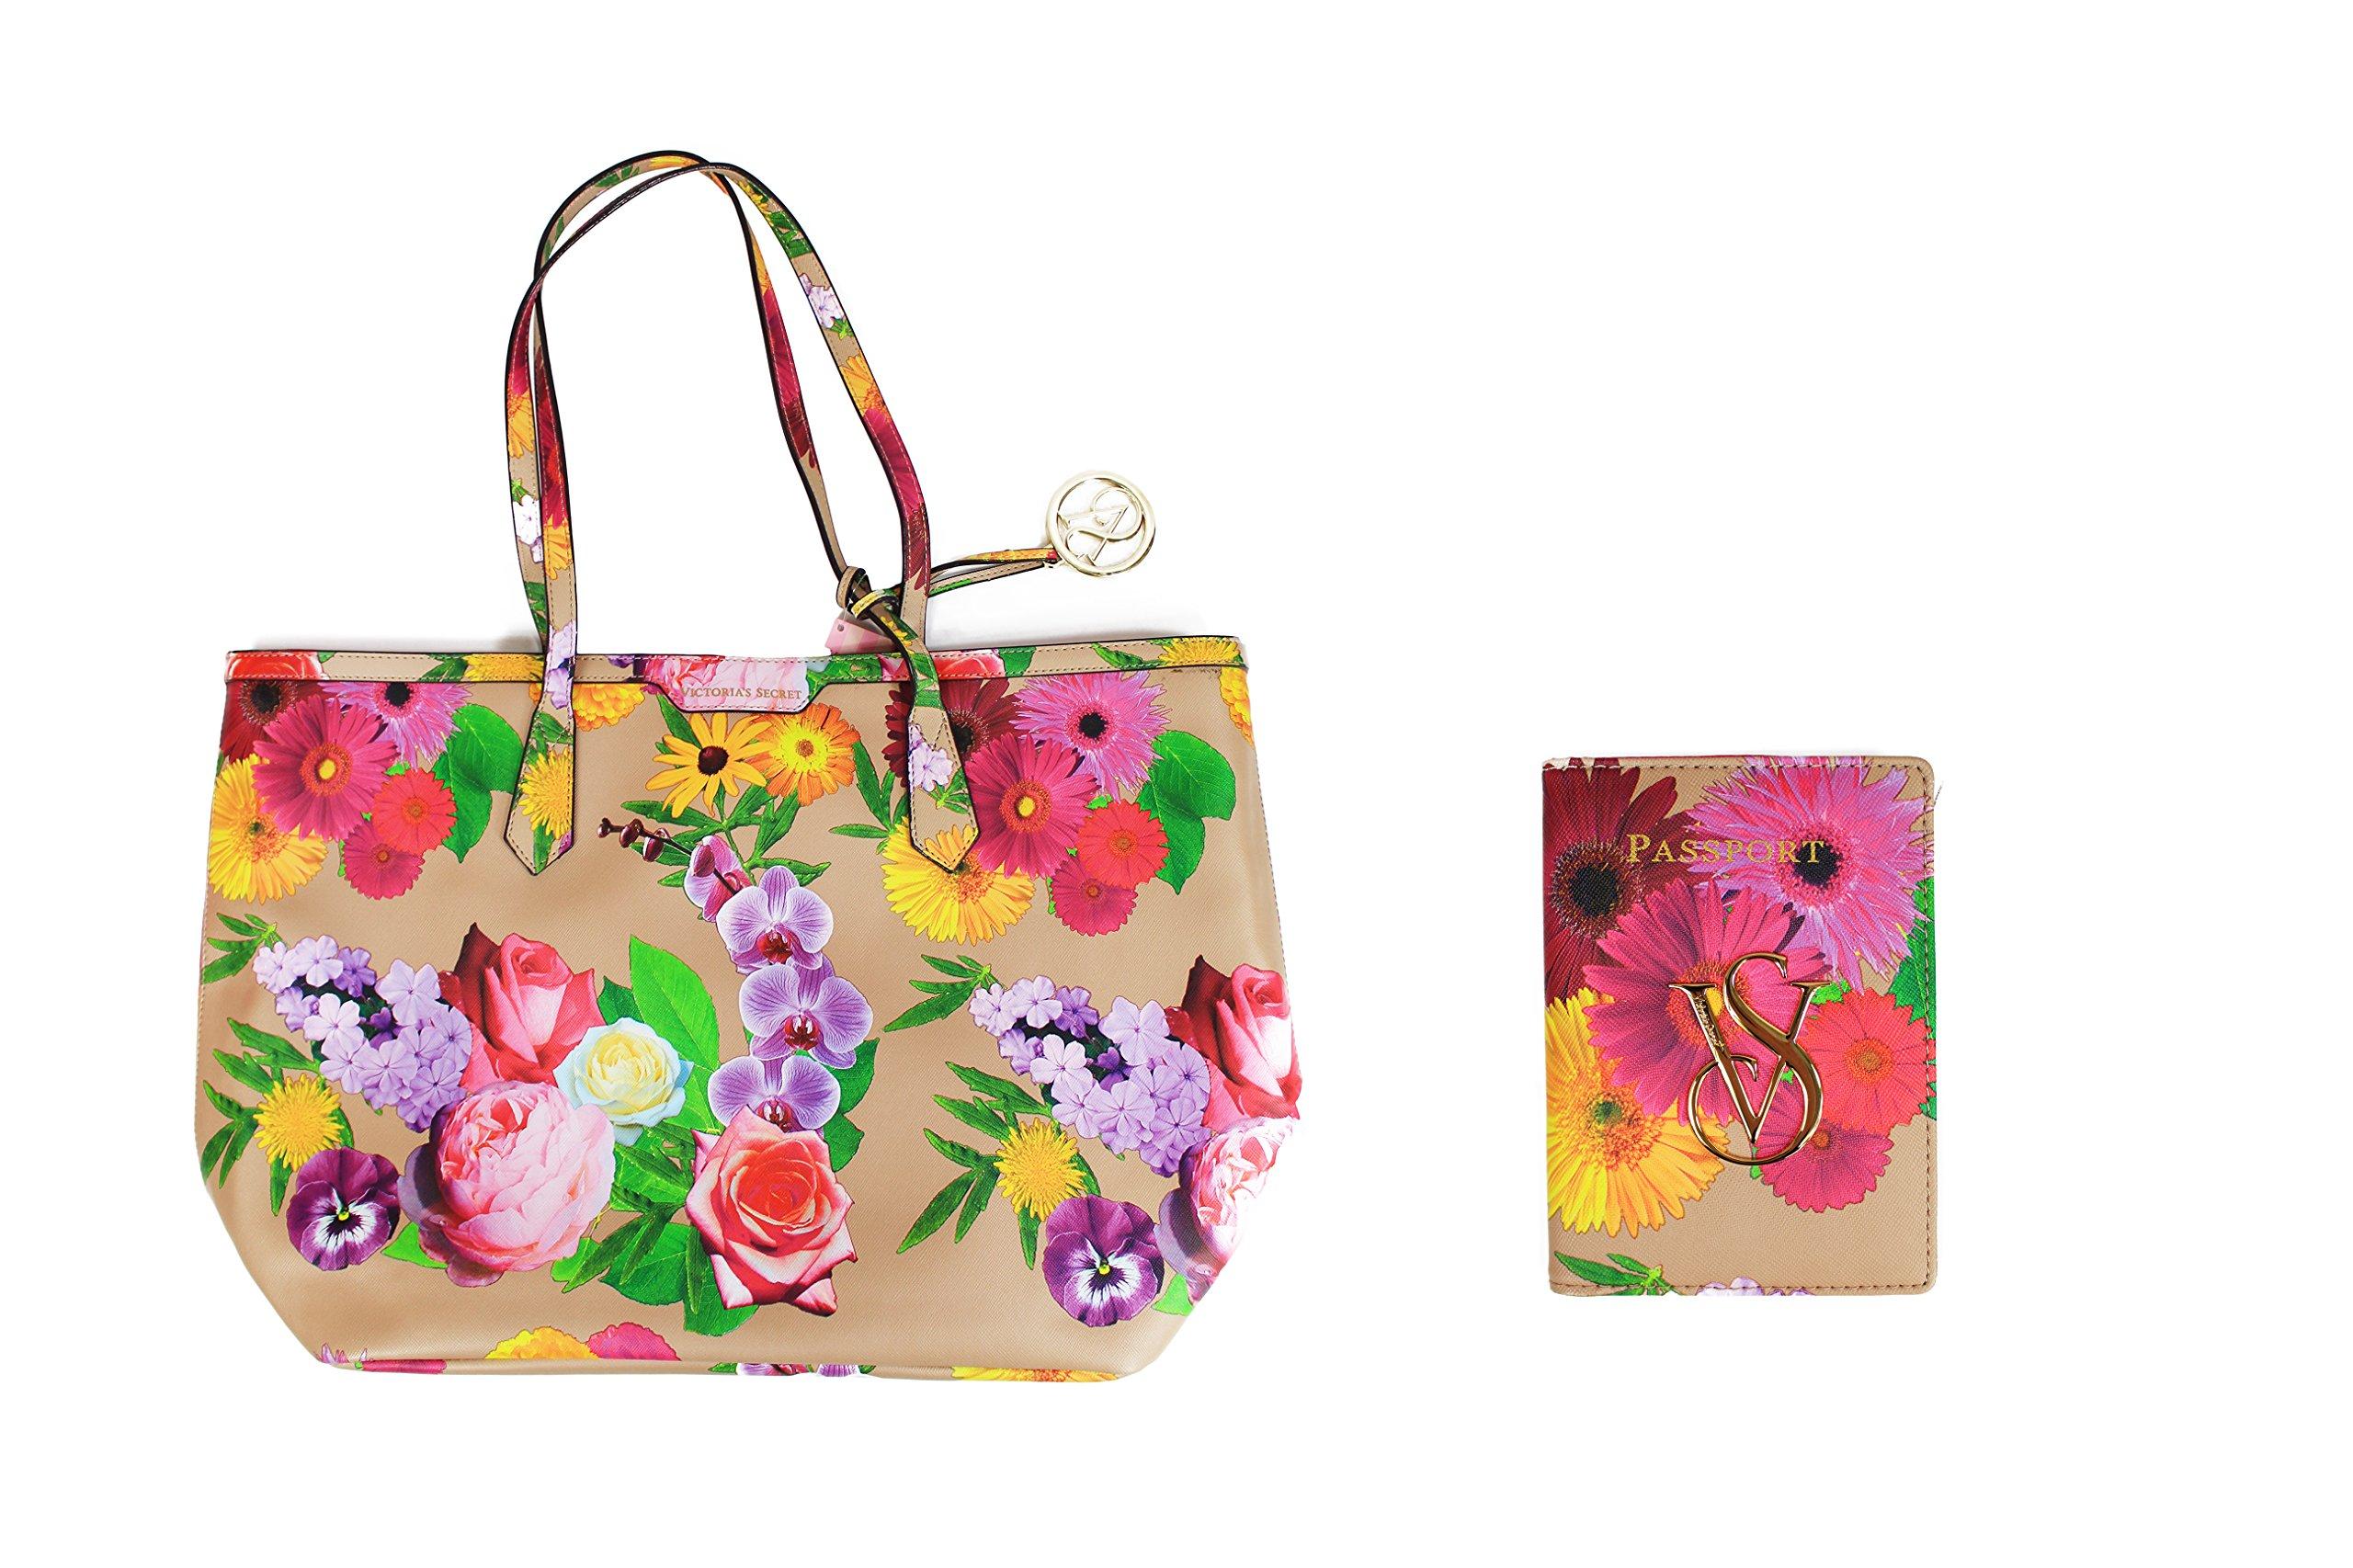 Victoria's Secret Leather Floral Large Tote Bag & Passport